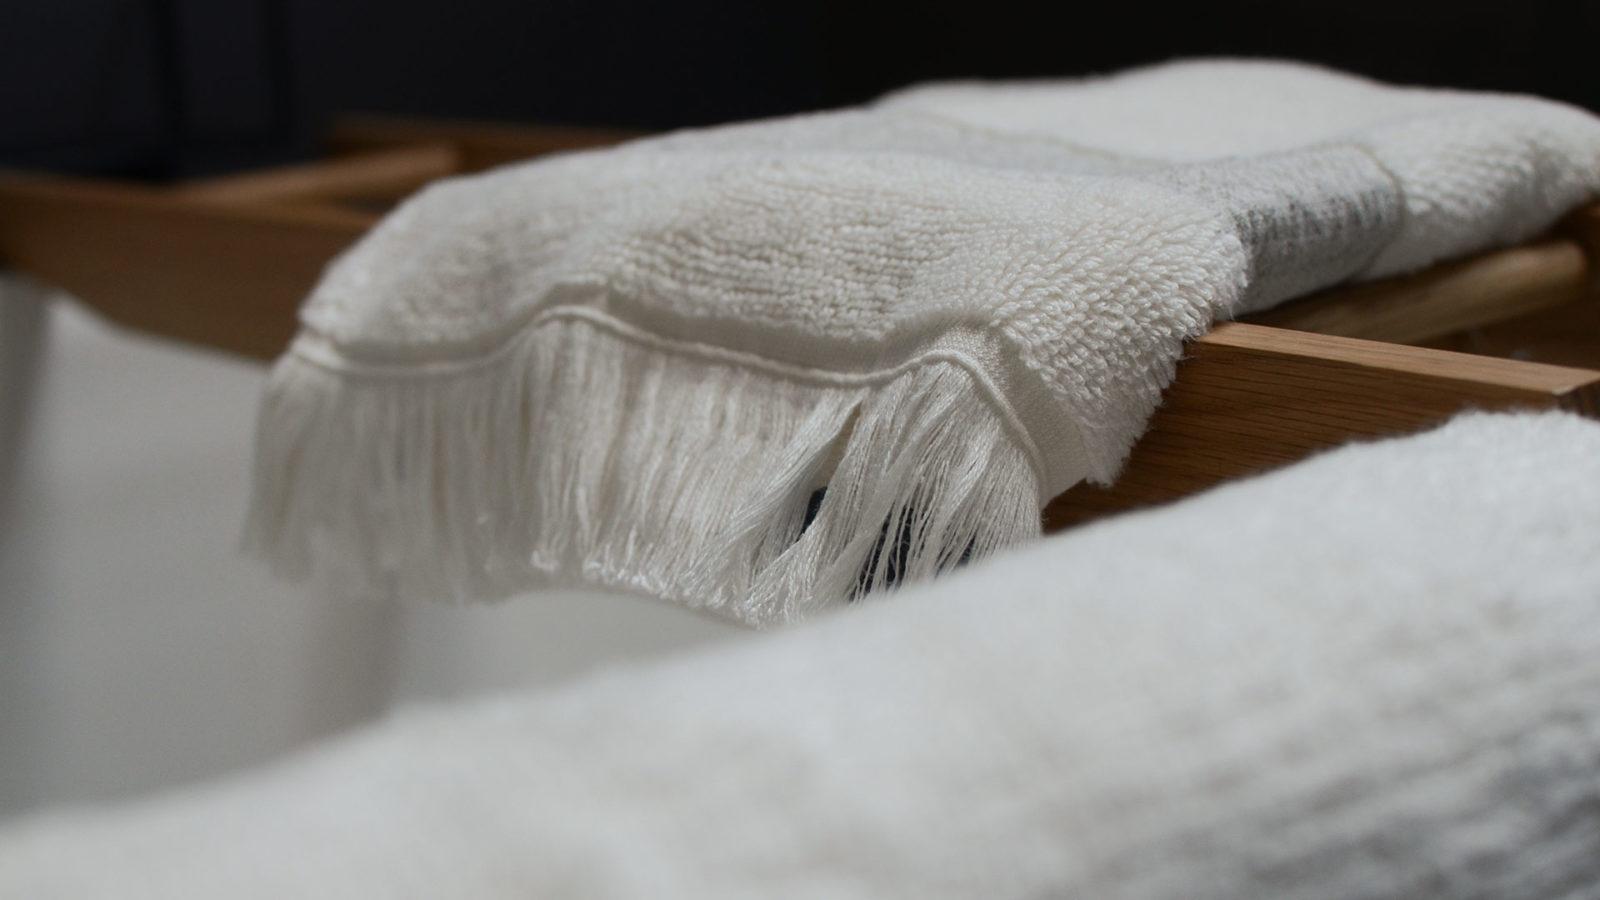 ultra-soft-fringed-towel-detail